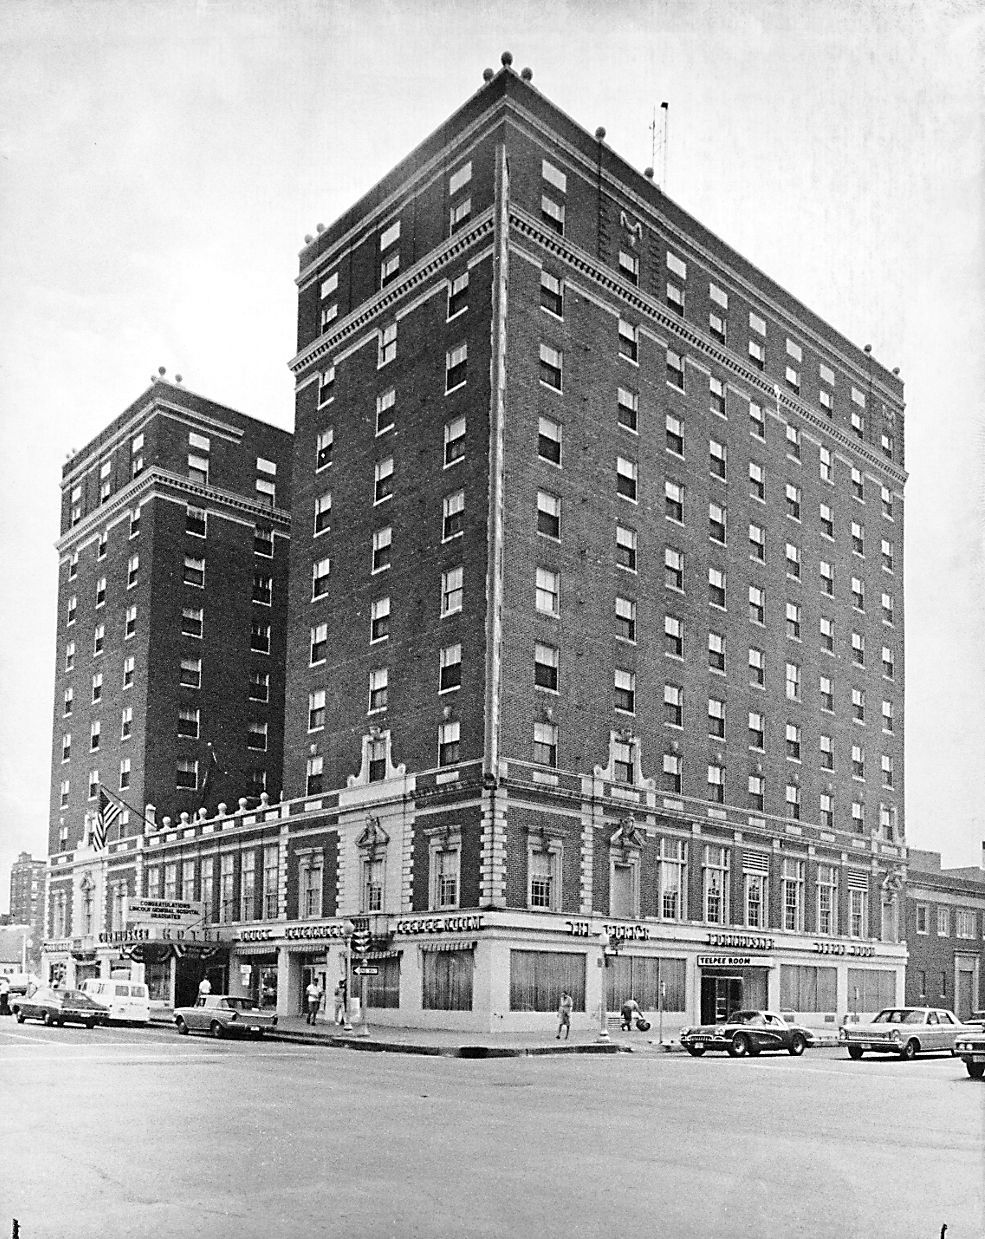 Cornhusker Hotel